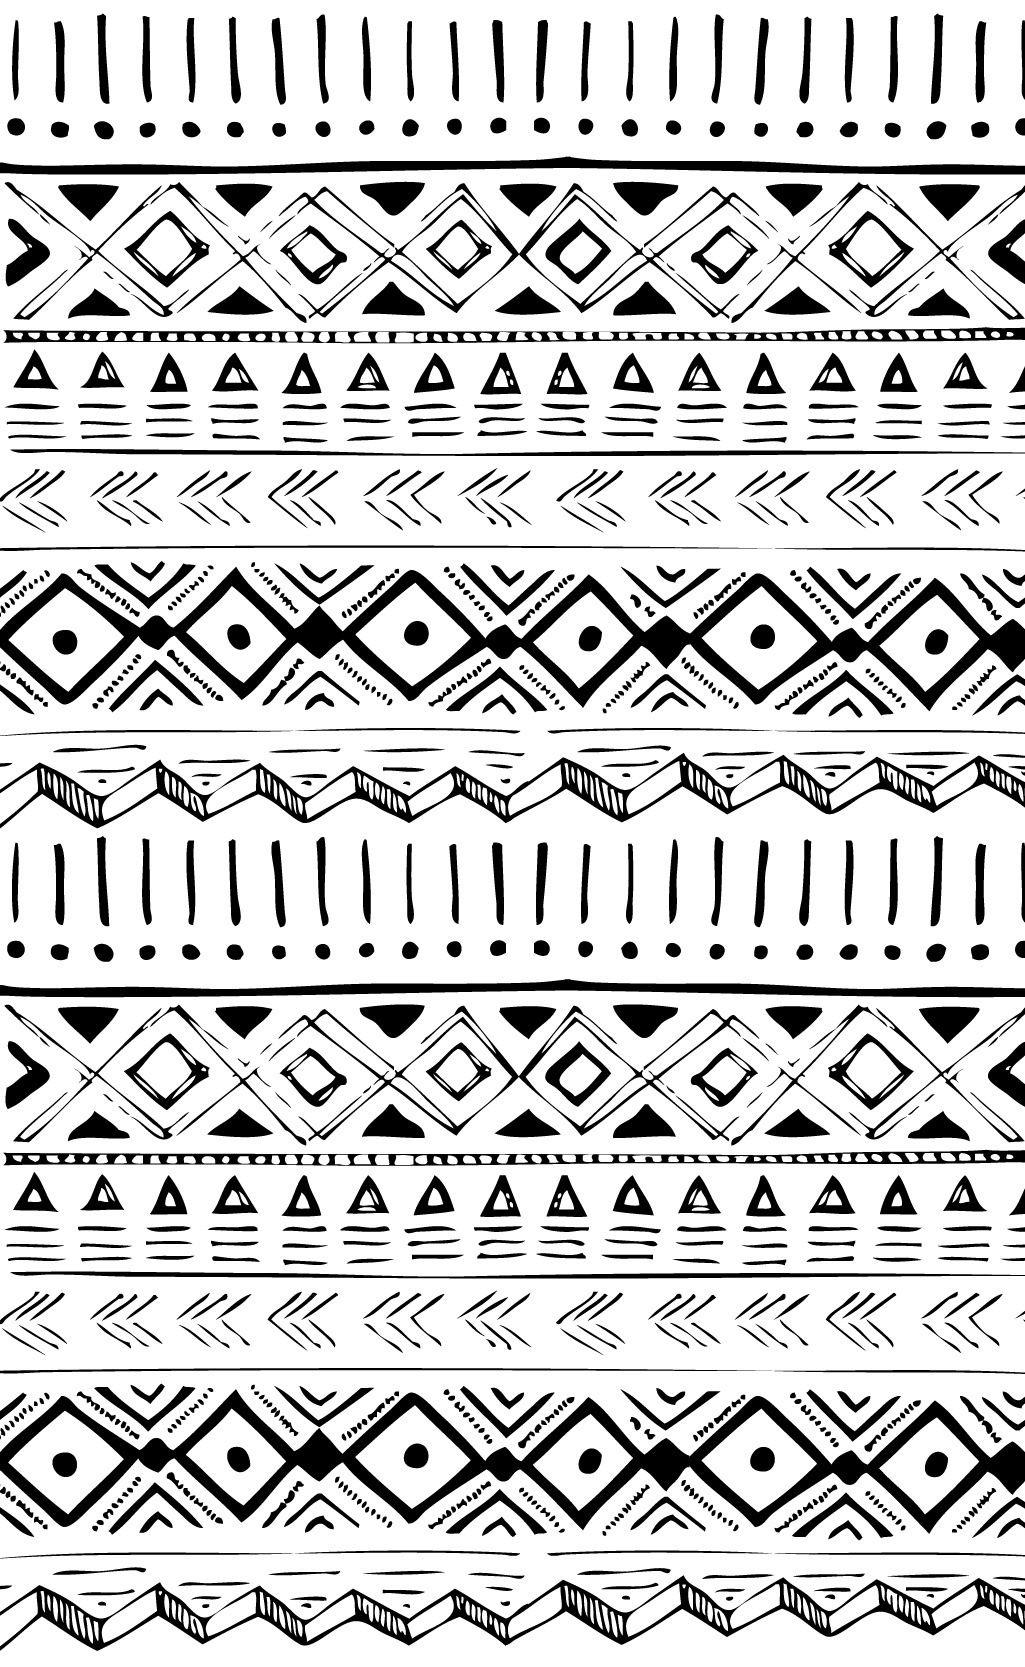 aztec patterns for mandalas | Mandalas in 2018 | Pinterest ...